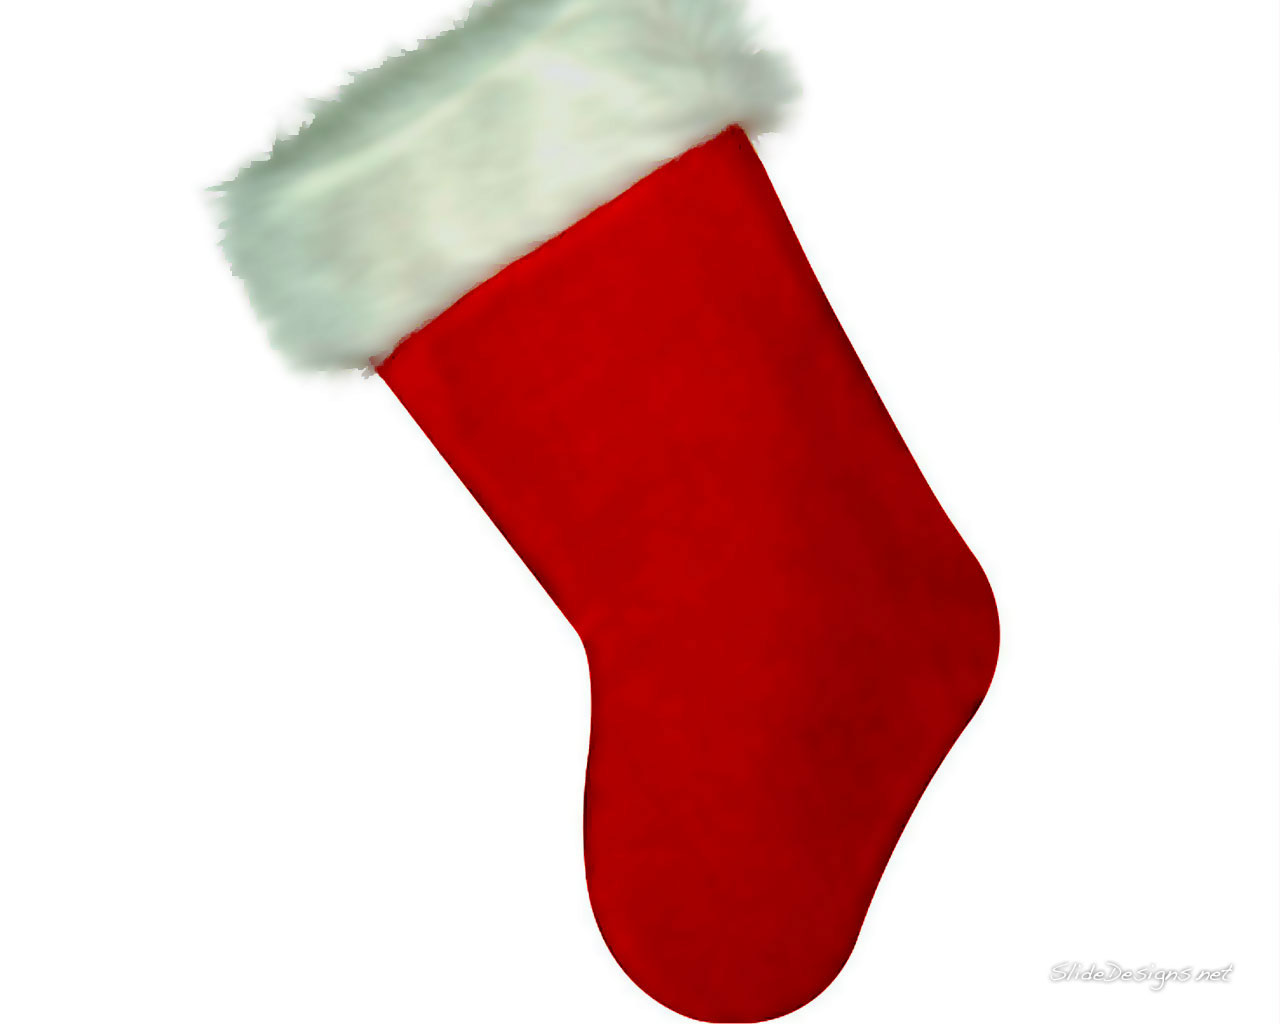 ... -clipart-merry-christmas-clip-art-merry-christmas-clipart-7.jpg